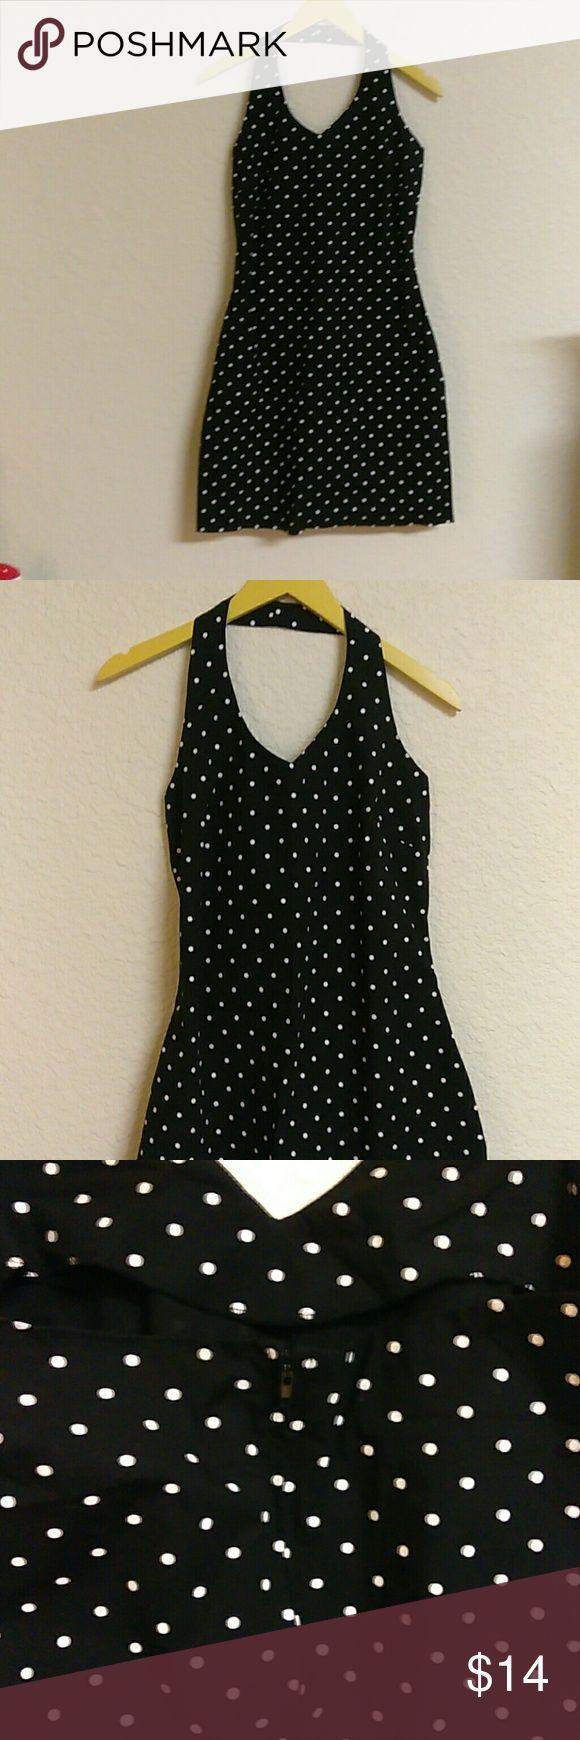 Women's a fortiori mini halter dress Mini halter top zip up polka dot dress size Medium. 97% Cotton. 3% spandex. Form fitting A Fortiori  Dresses Mini